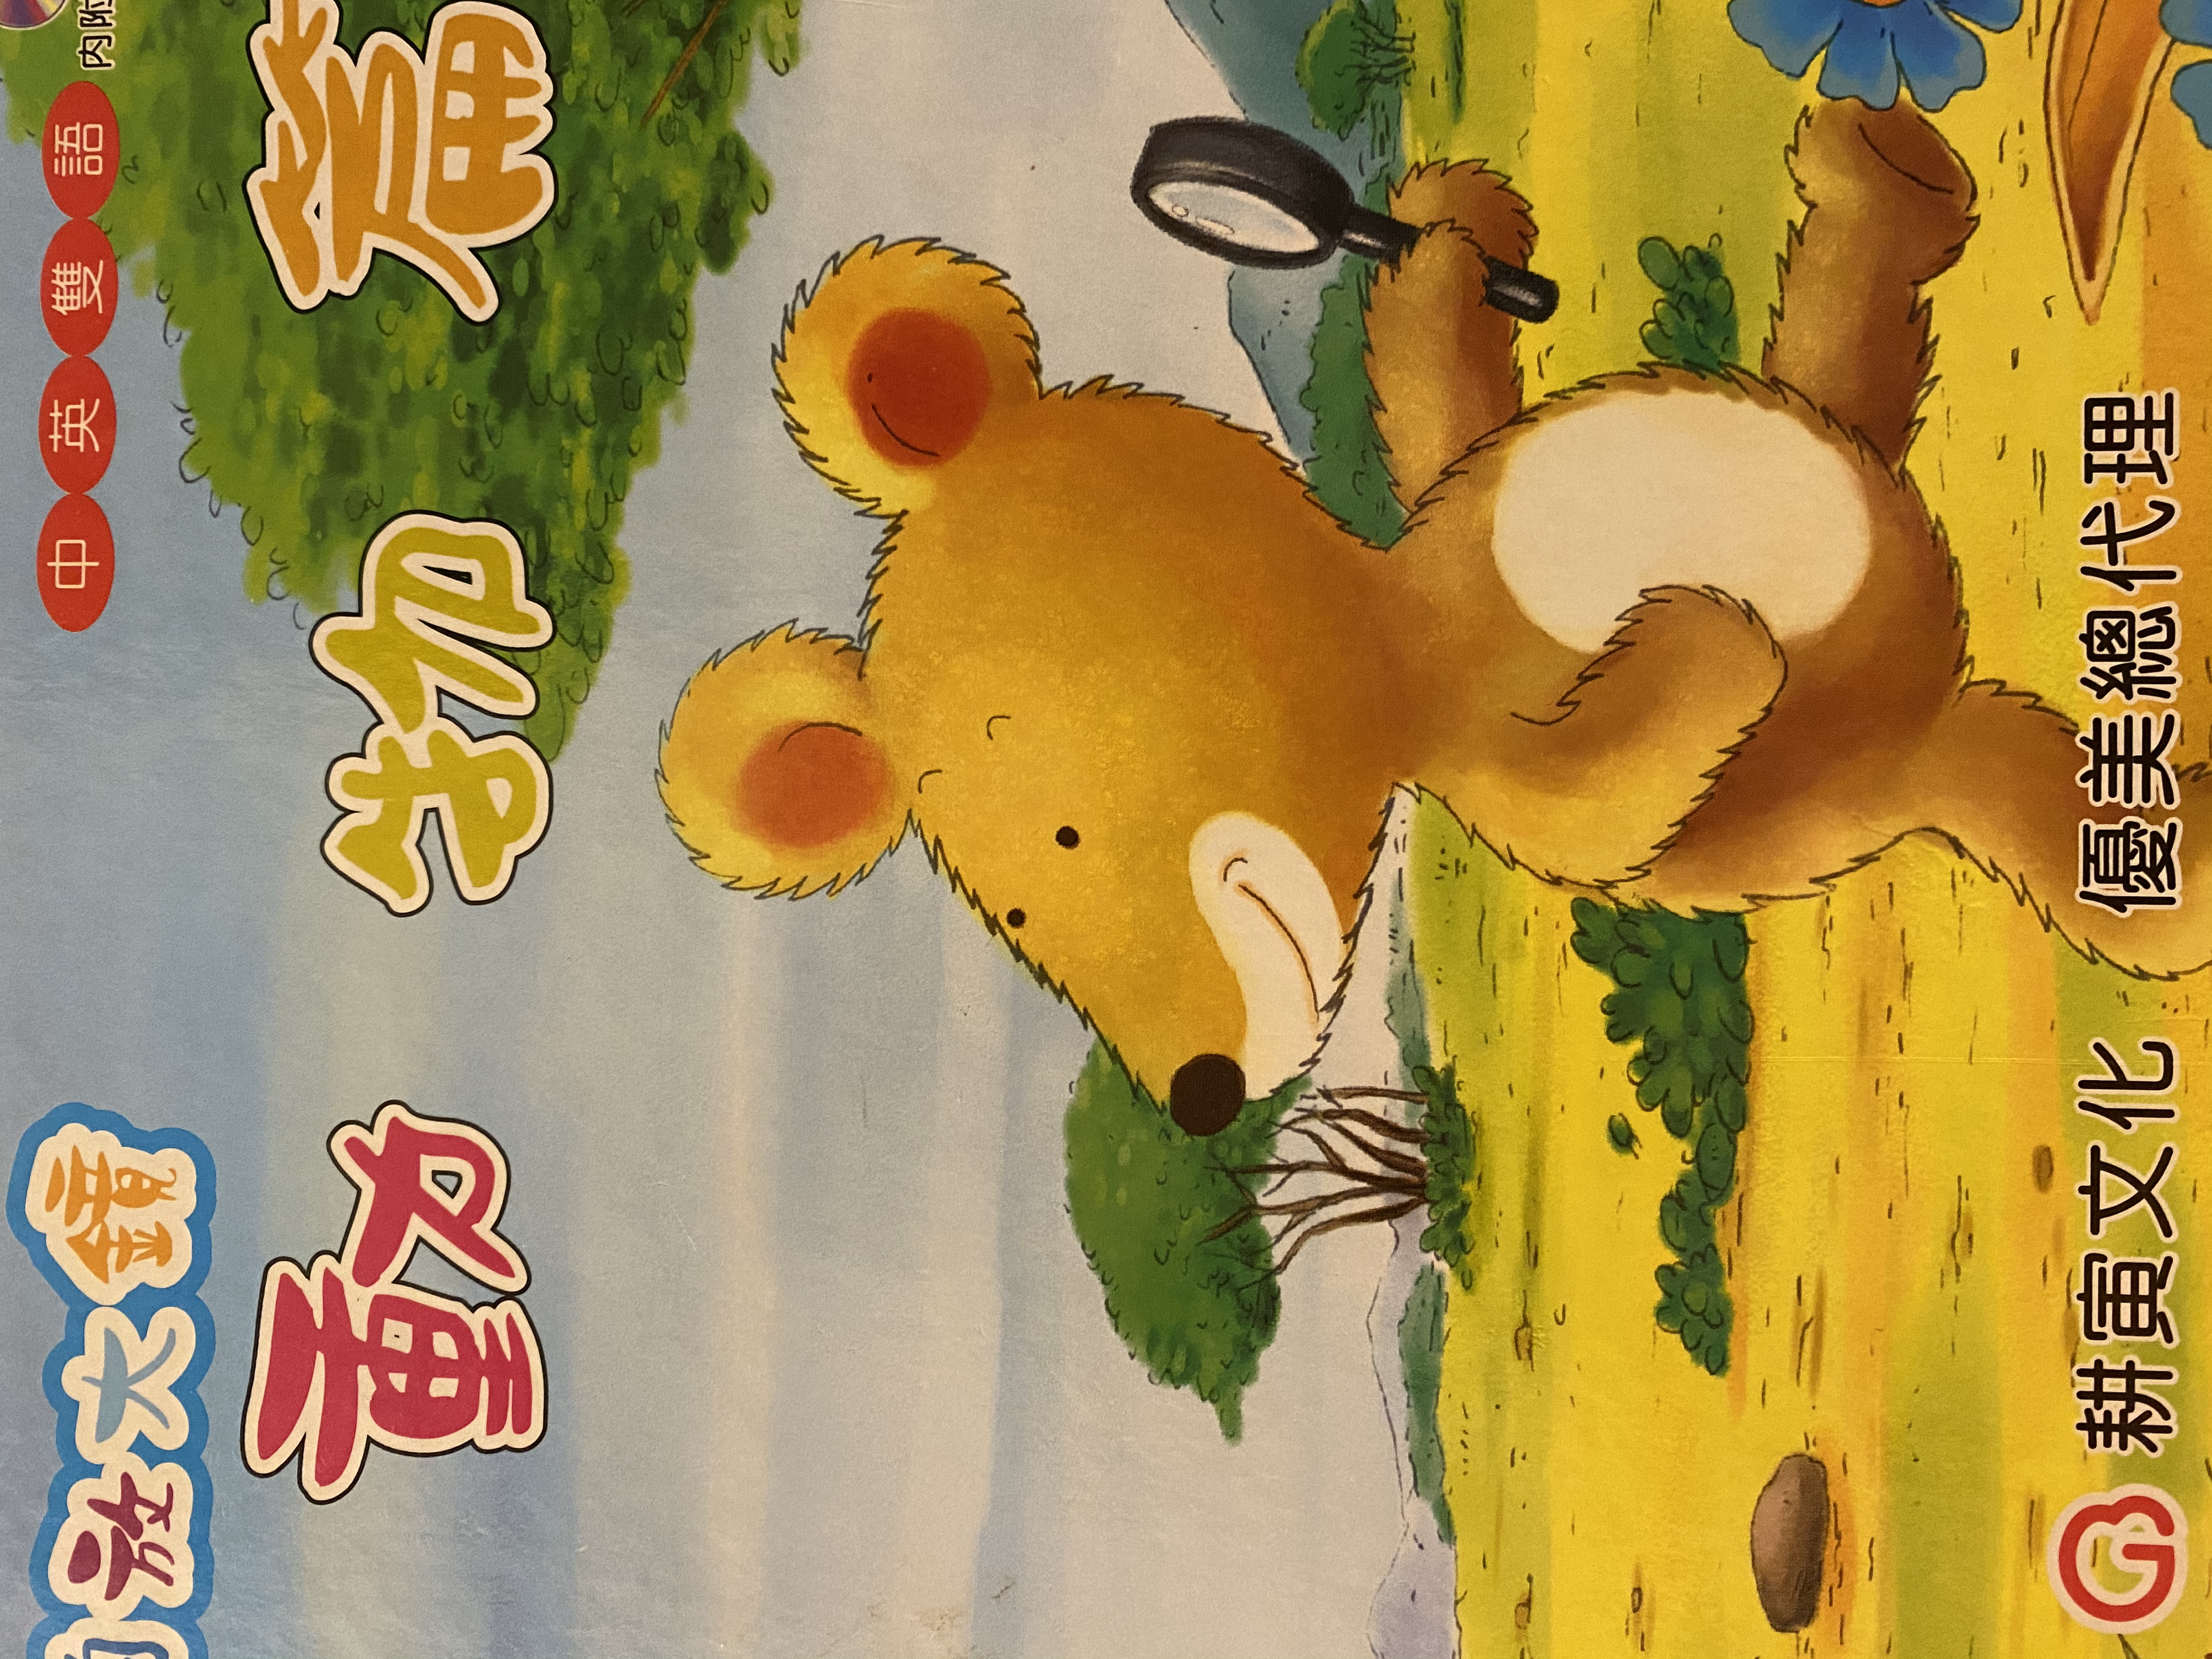 S3-113/ 動物篇/ 神奇的放大鏡/ 耕寅文化 優美總代理